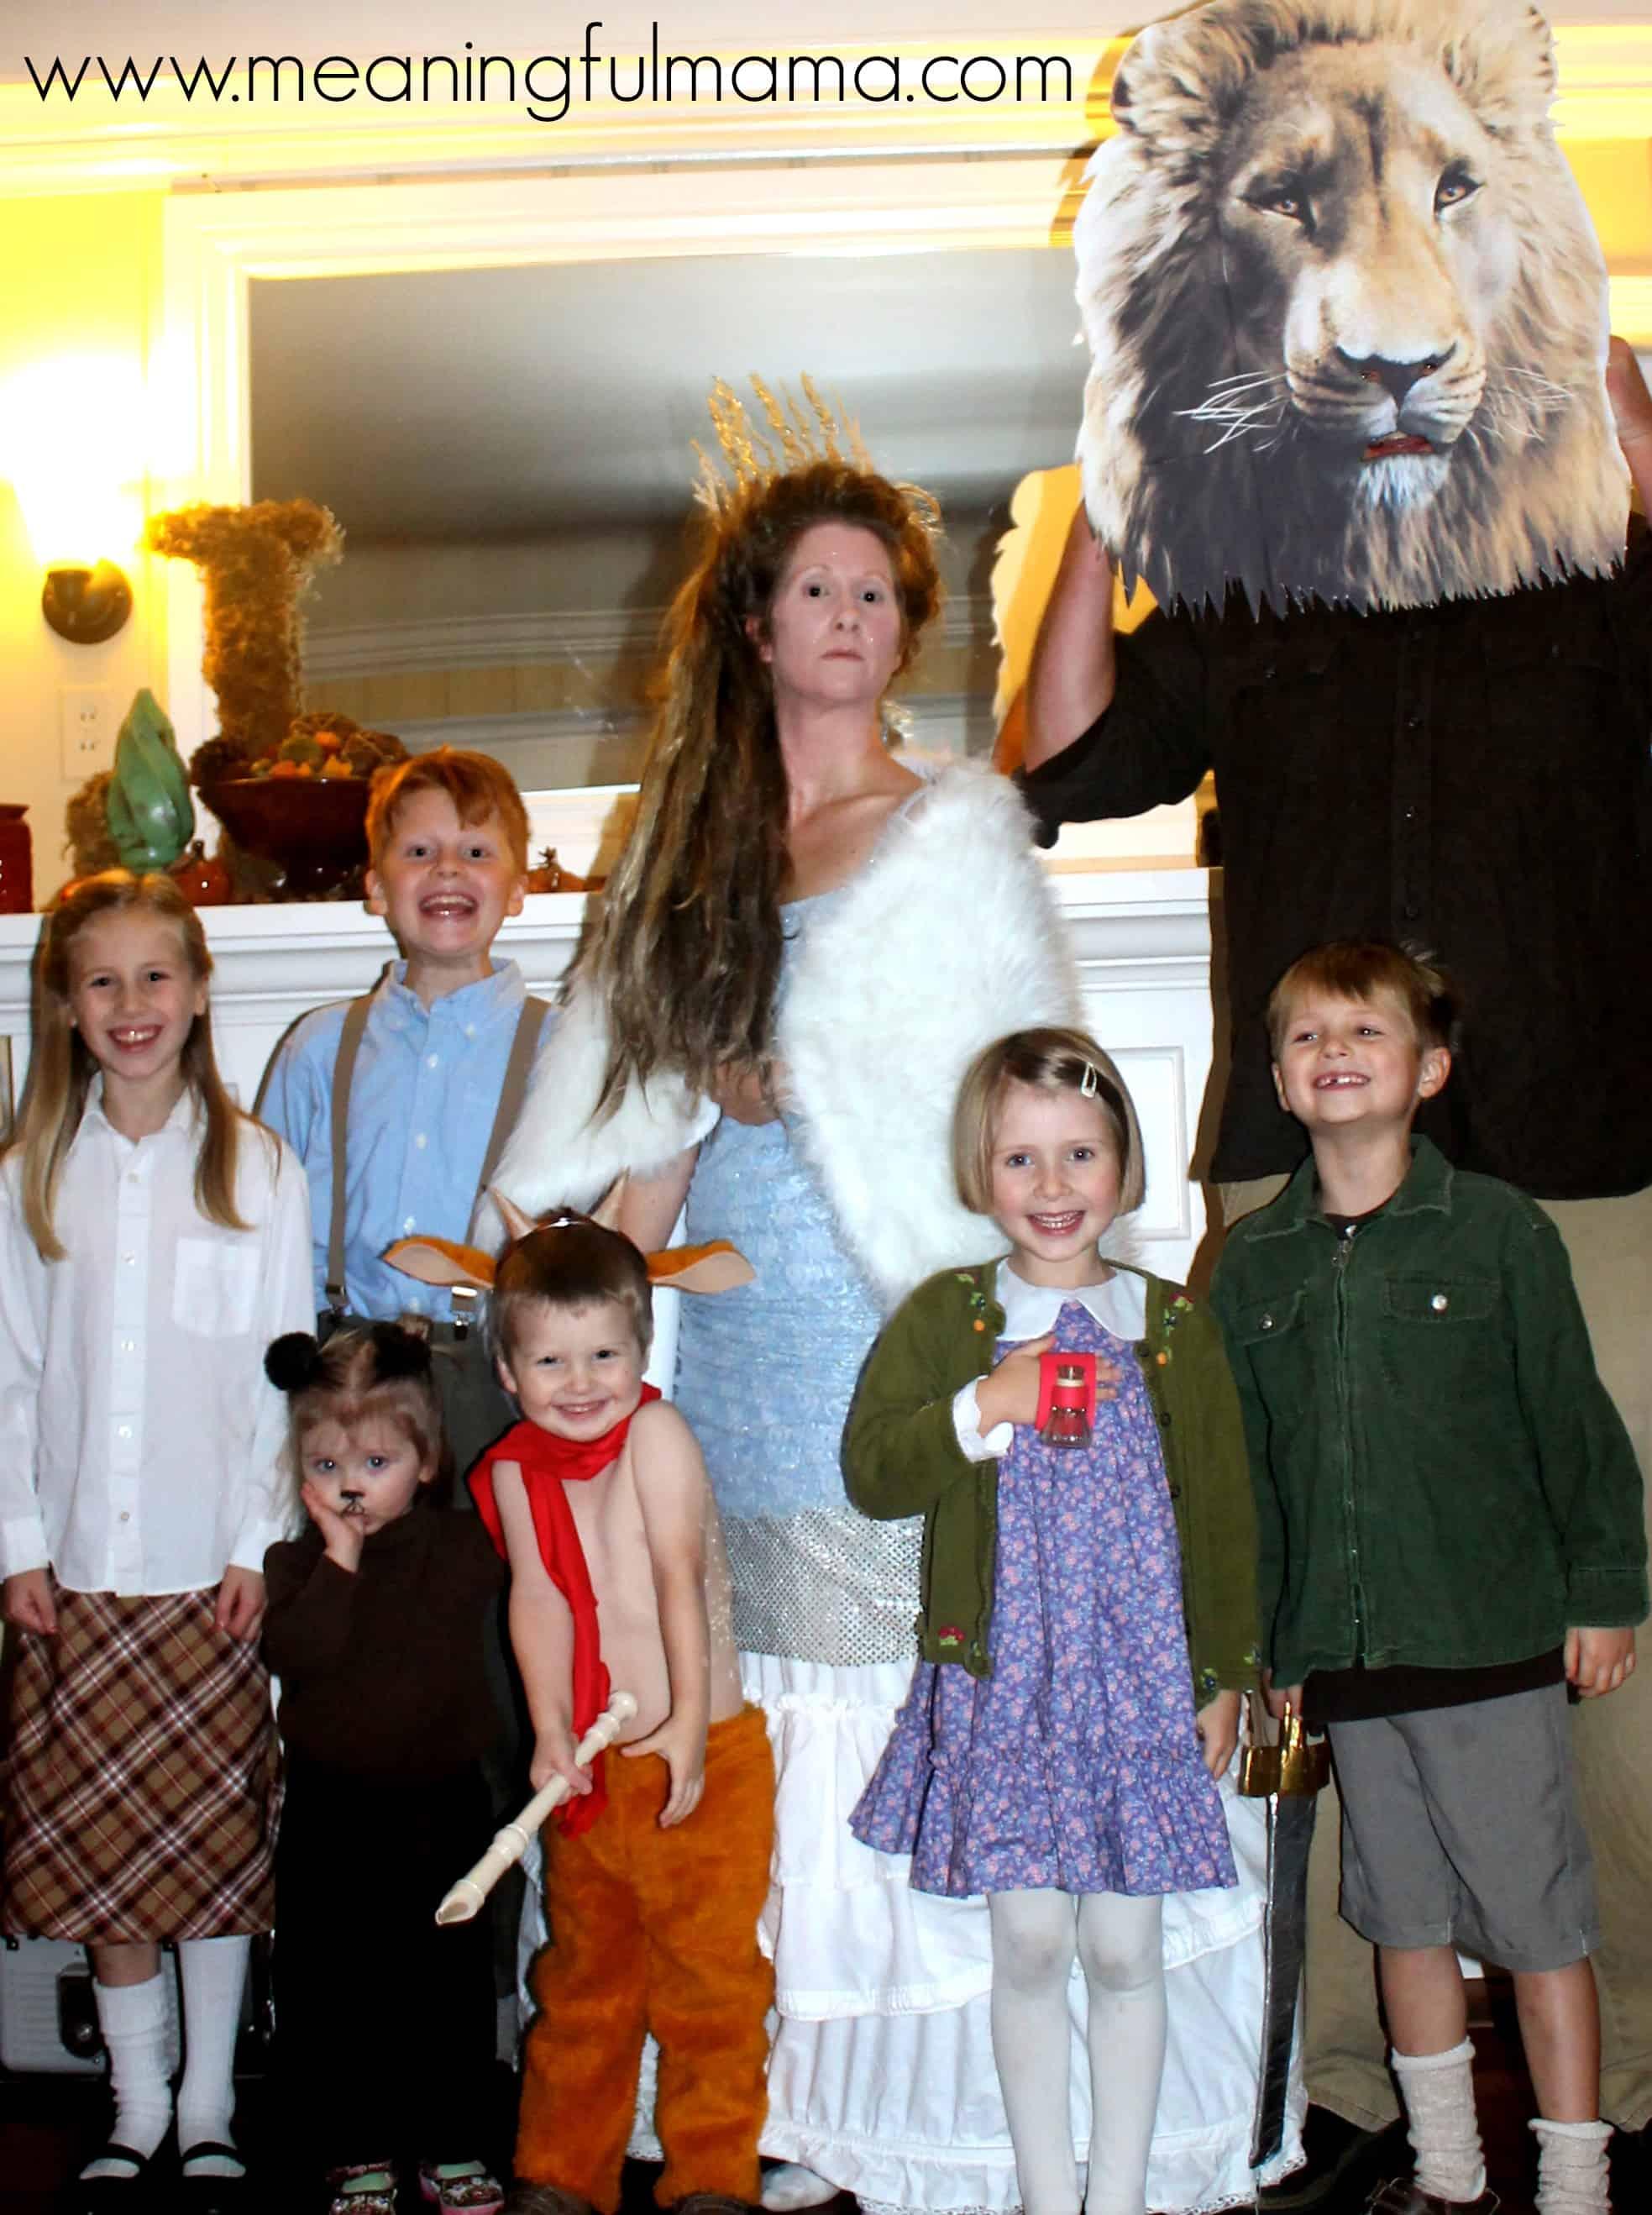 Halloween Family Costumes halloween family costumes ideas 15 Creative Family Costume Ideas